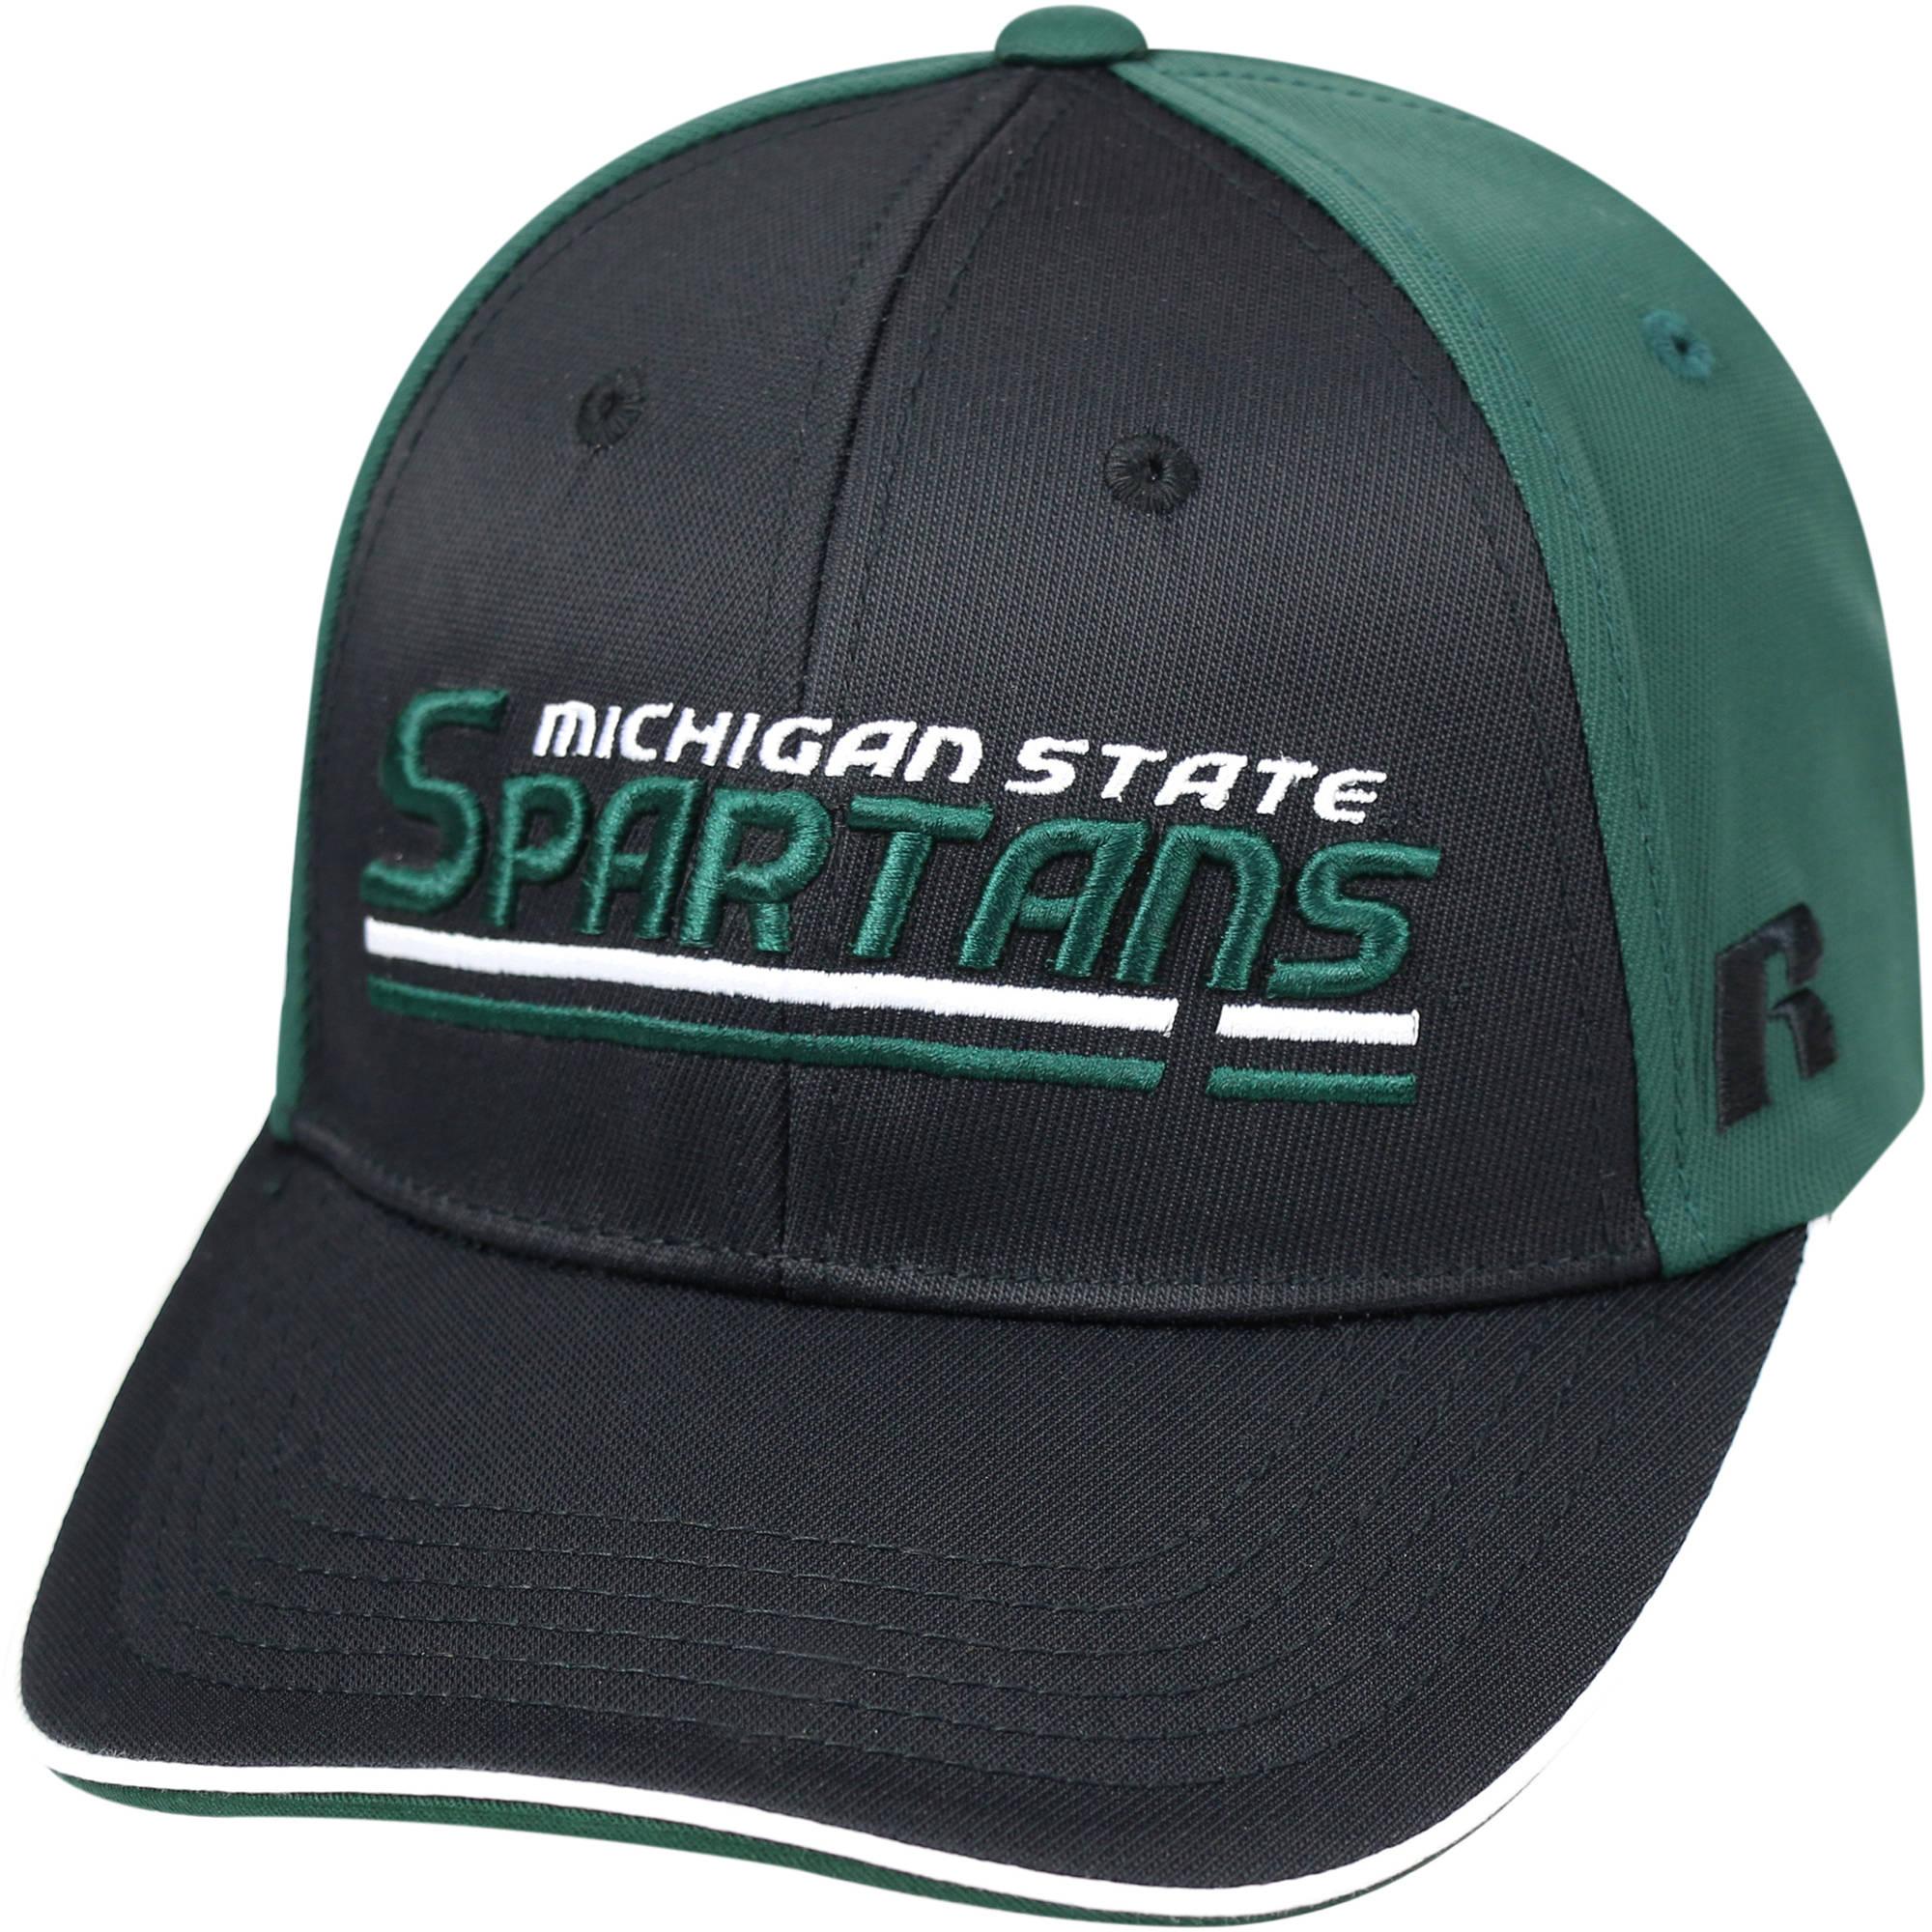 University Michigan State Spartans Away Two Tone Baseball Cap